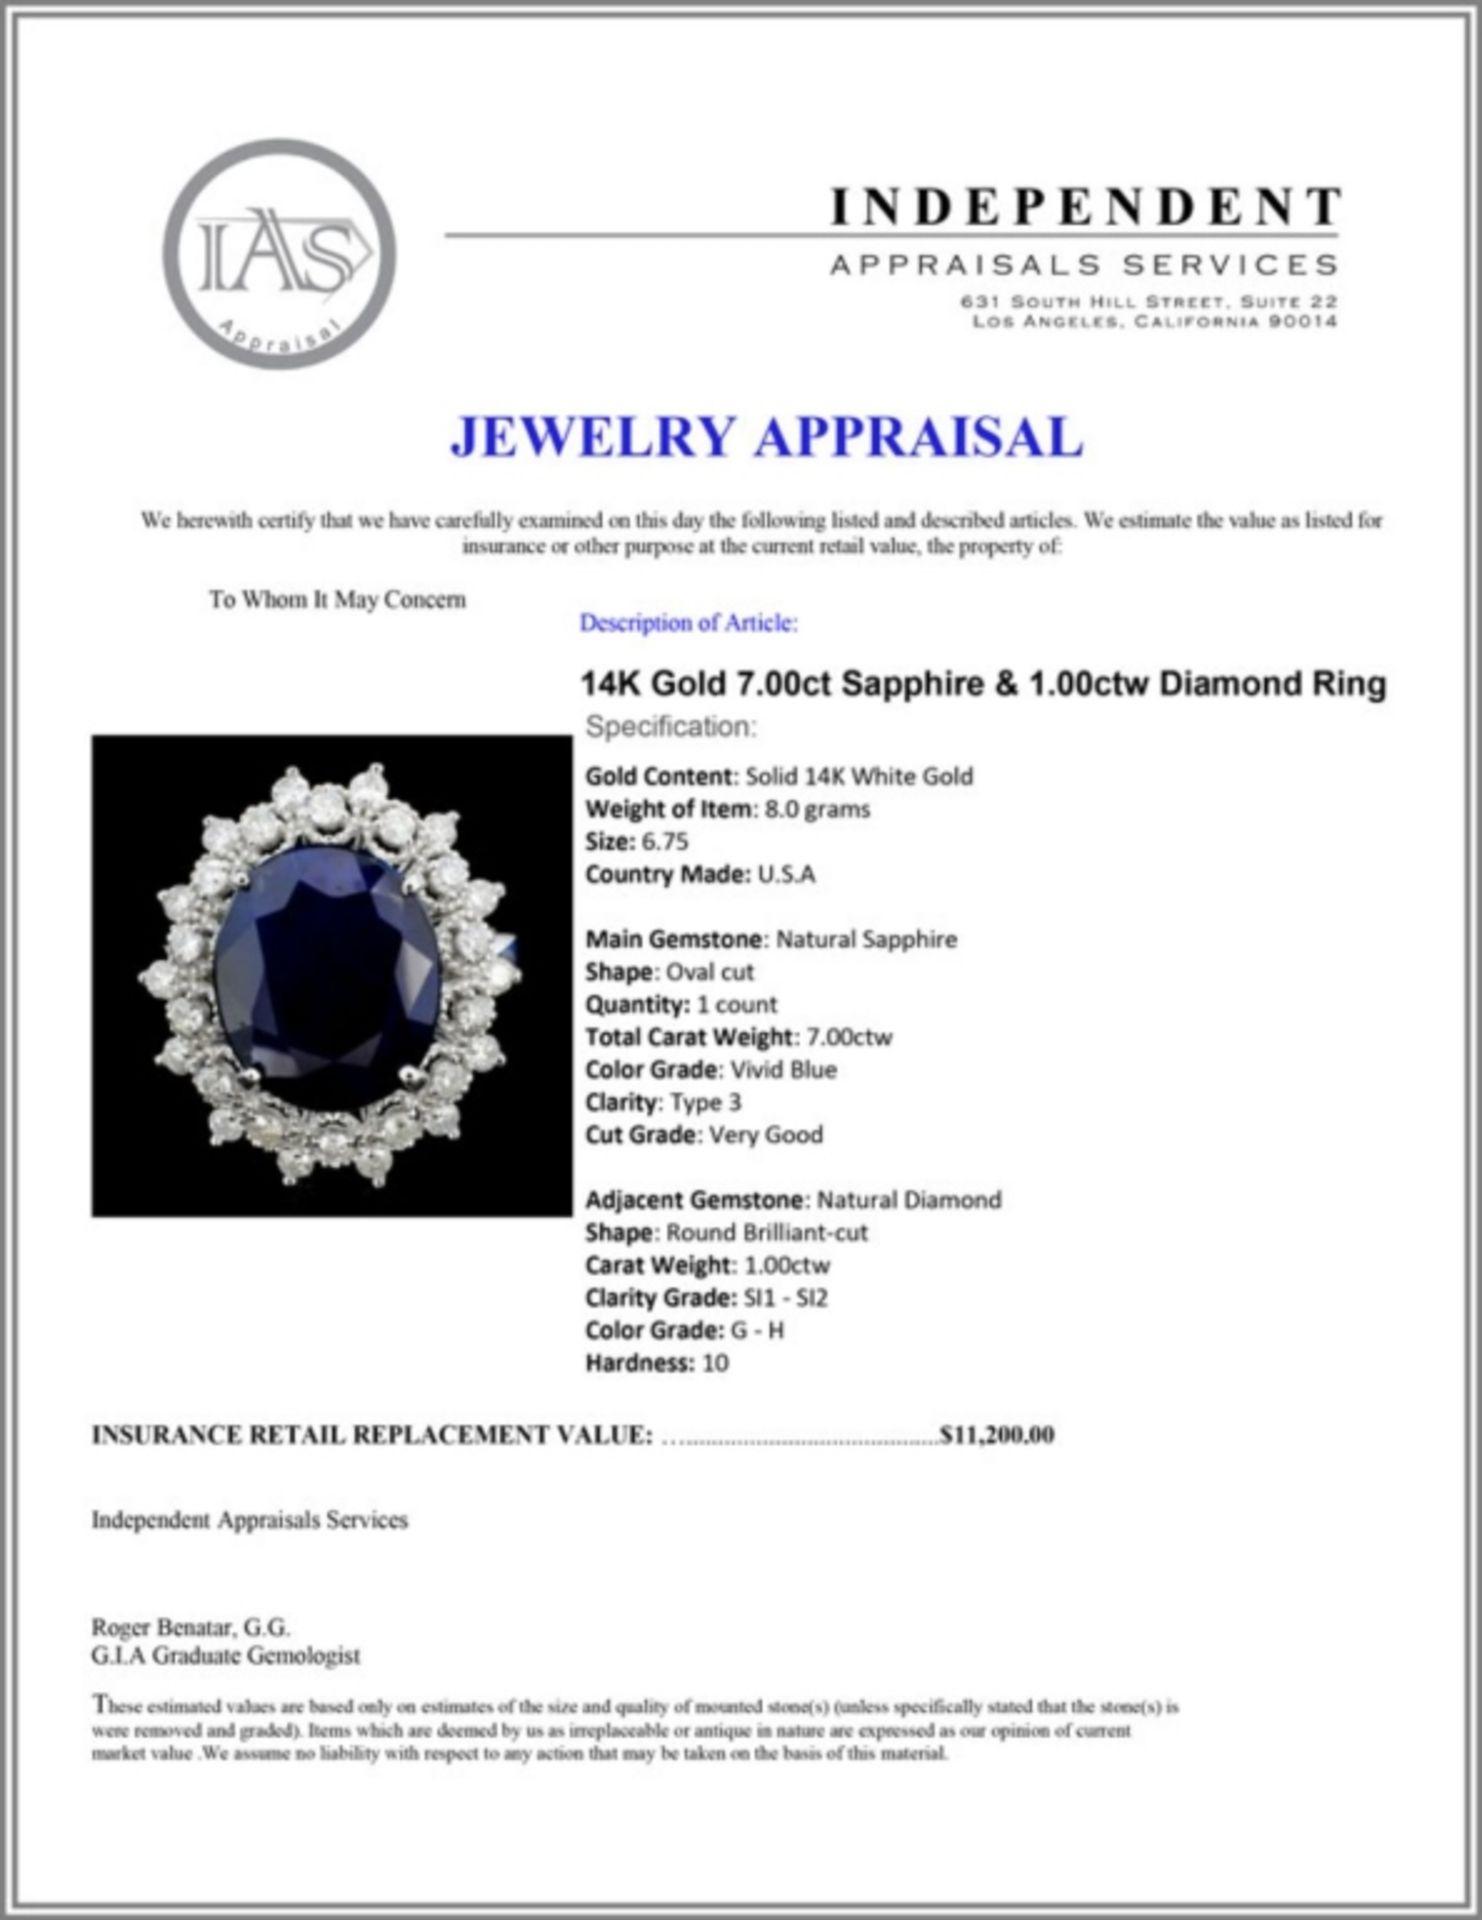 14K Gold 7.00ct Sapphire & 1.00ctw Diamond Ring - Image 4 of 4